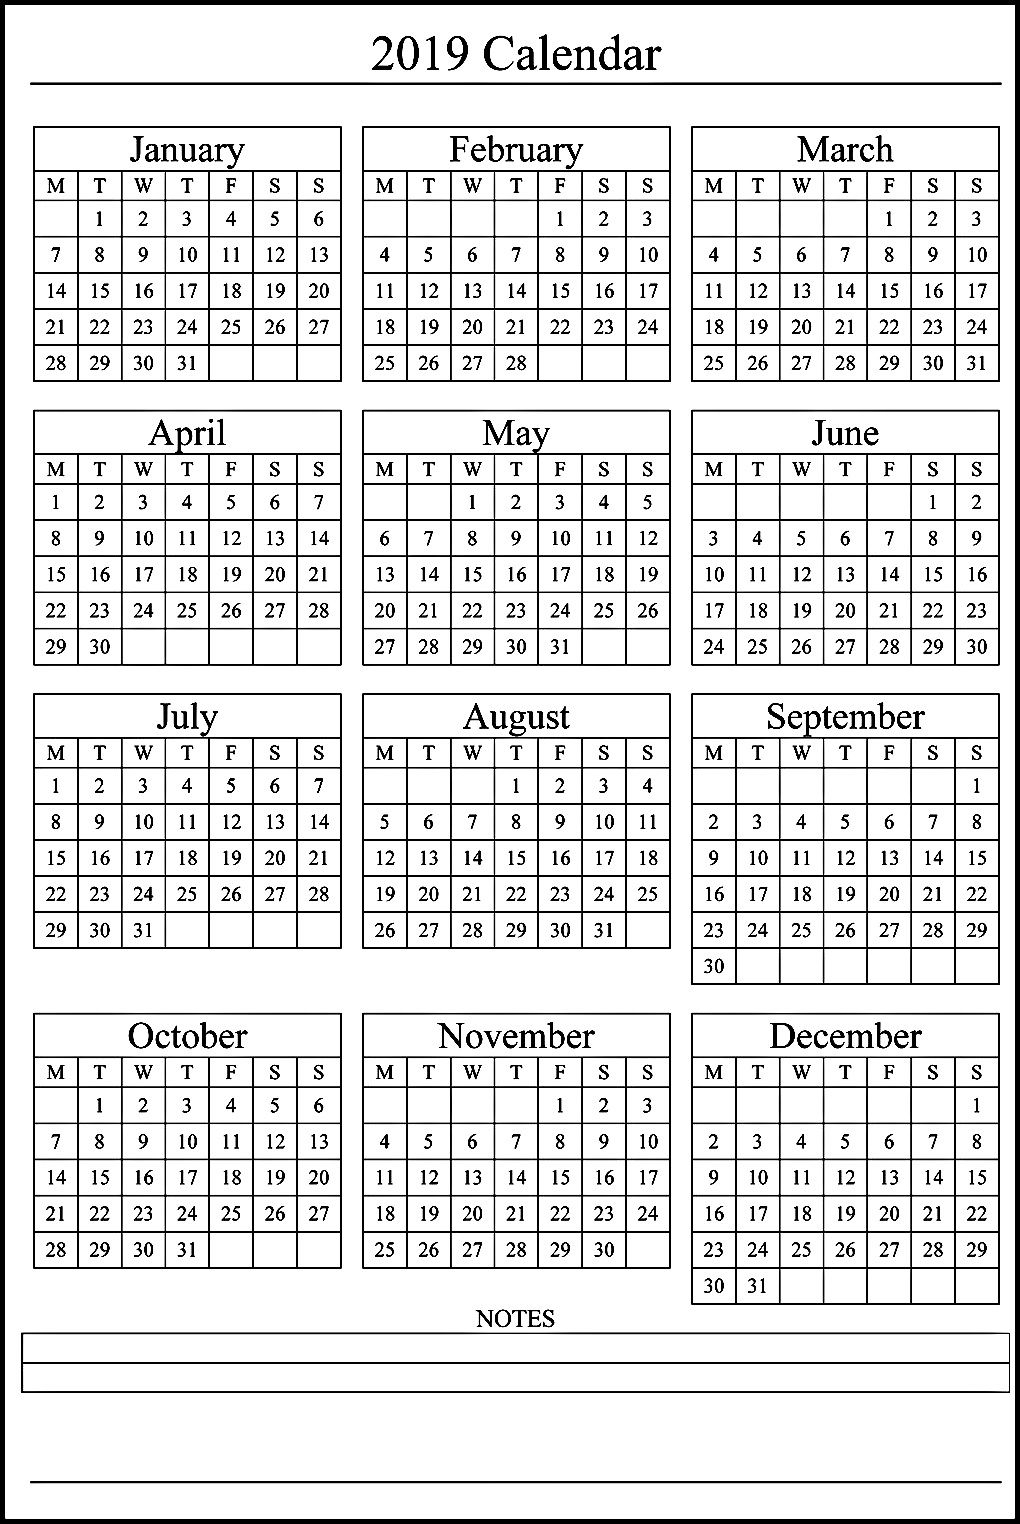 Free Printable 2019 Calendar #calendar2019 #printablecalendar2019 for Blank 12 Month Calendar Printable